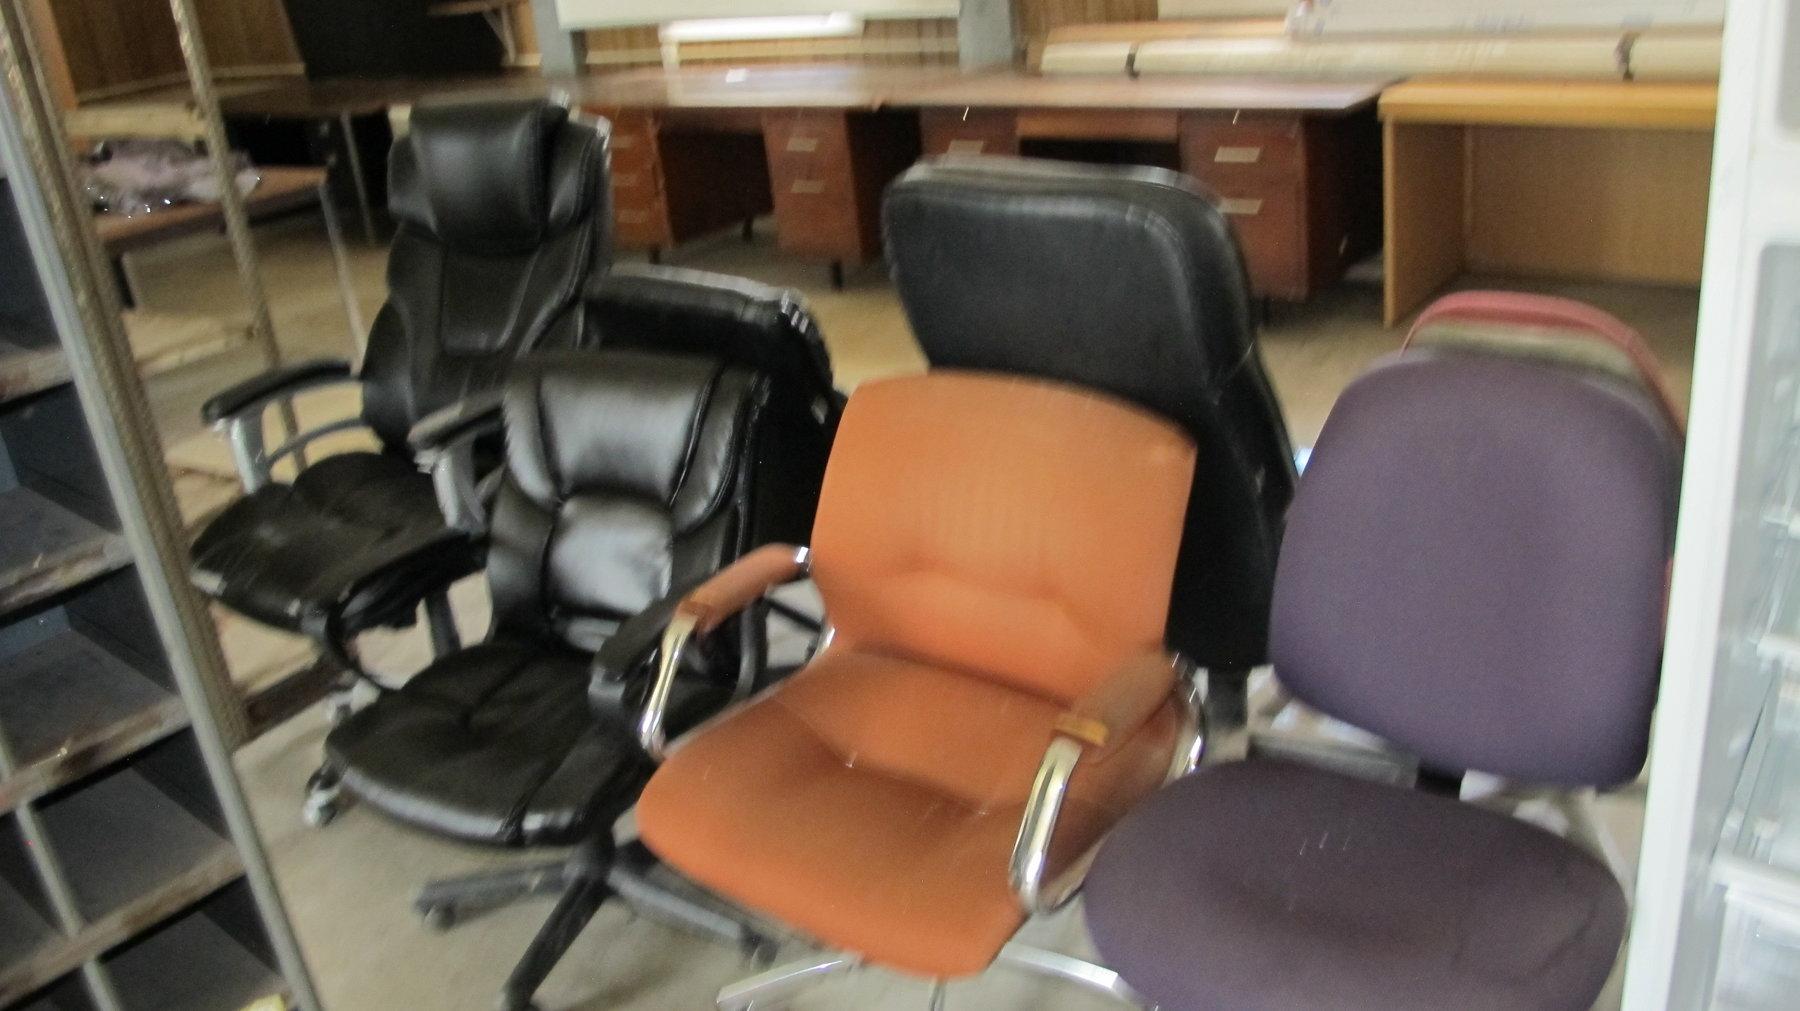 Image for Jul 31 @ 12:00PM EDT - ABSOLUTE SURPLUS EQUIPMENT AUCTION - Evington VA